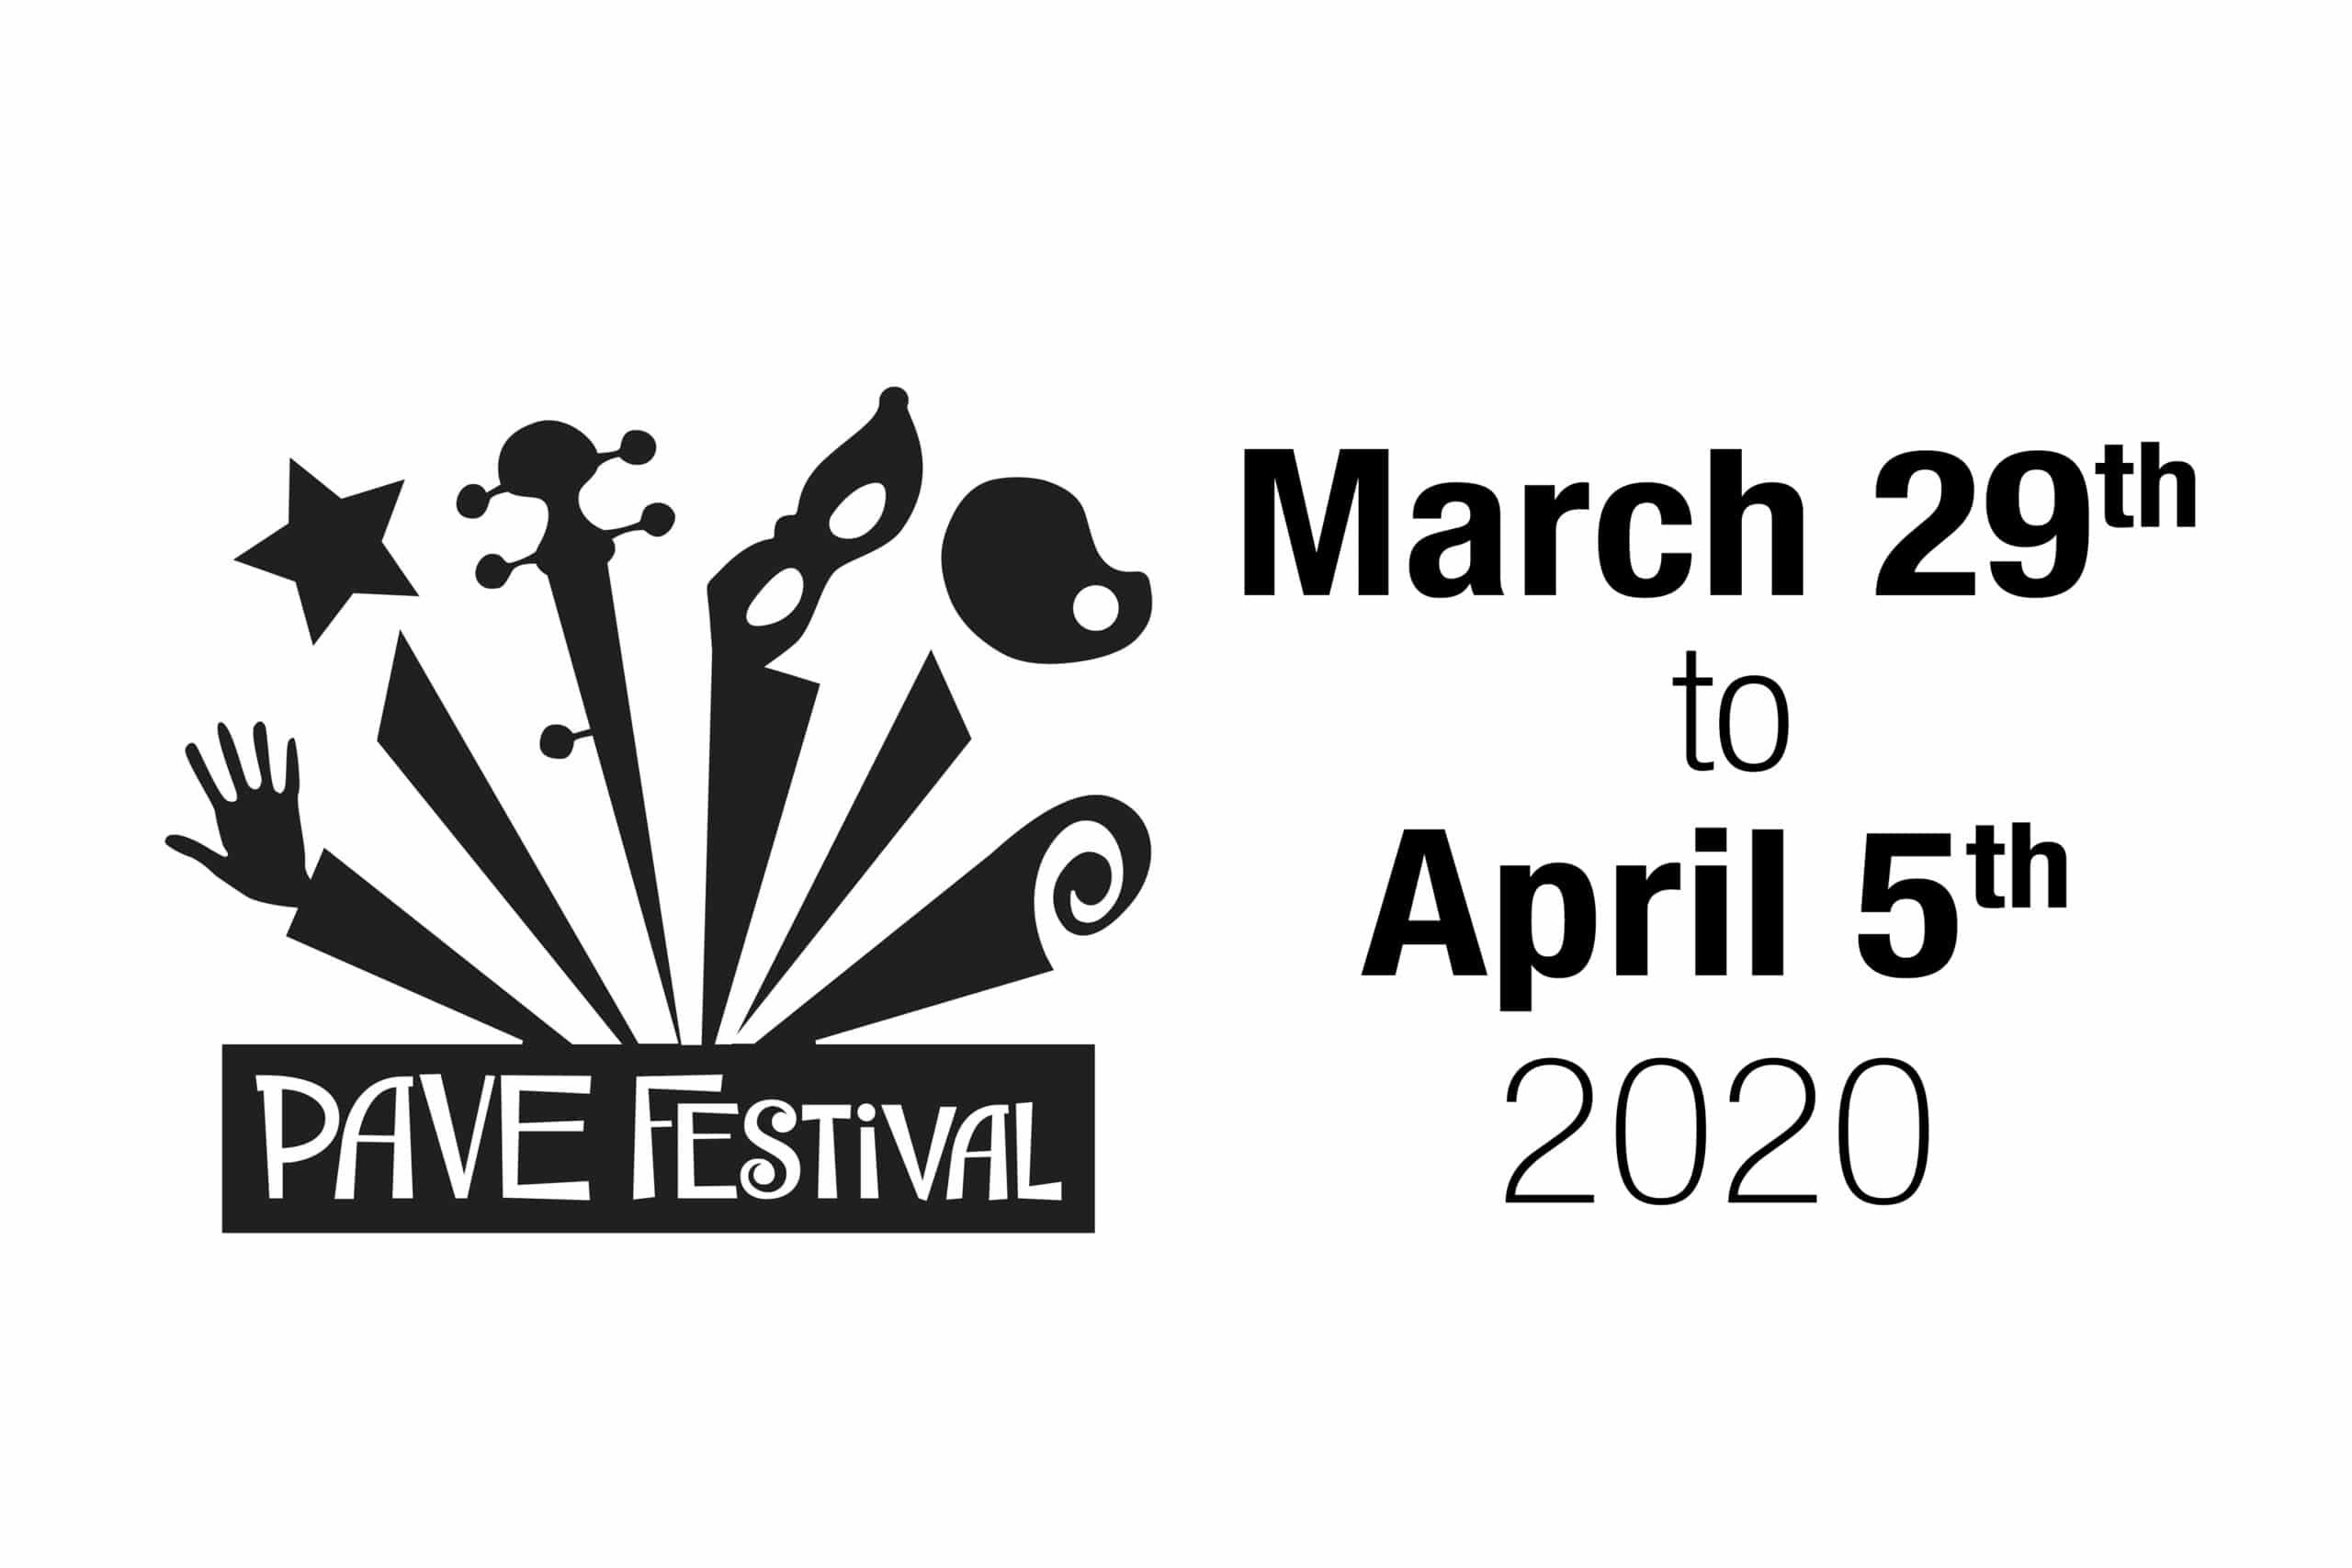 PAVE Festival